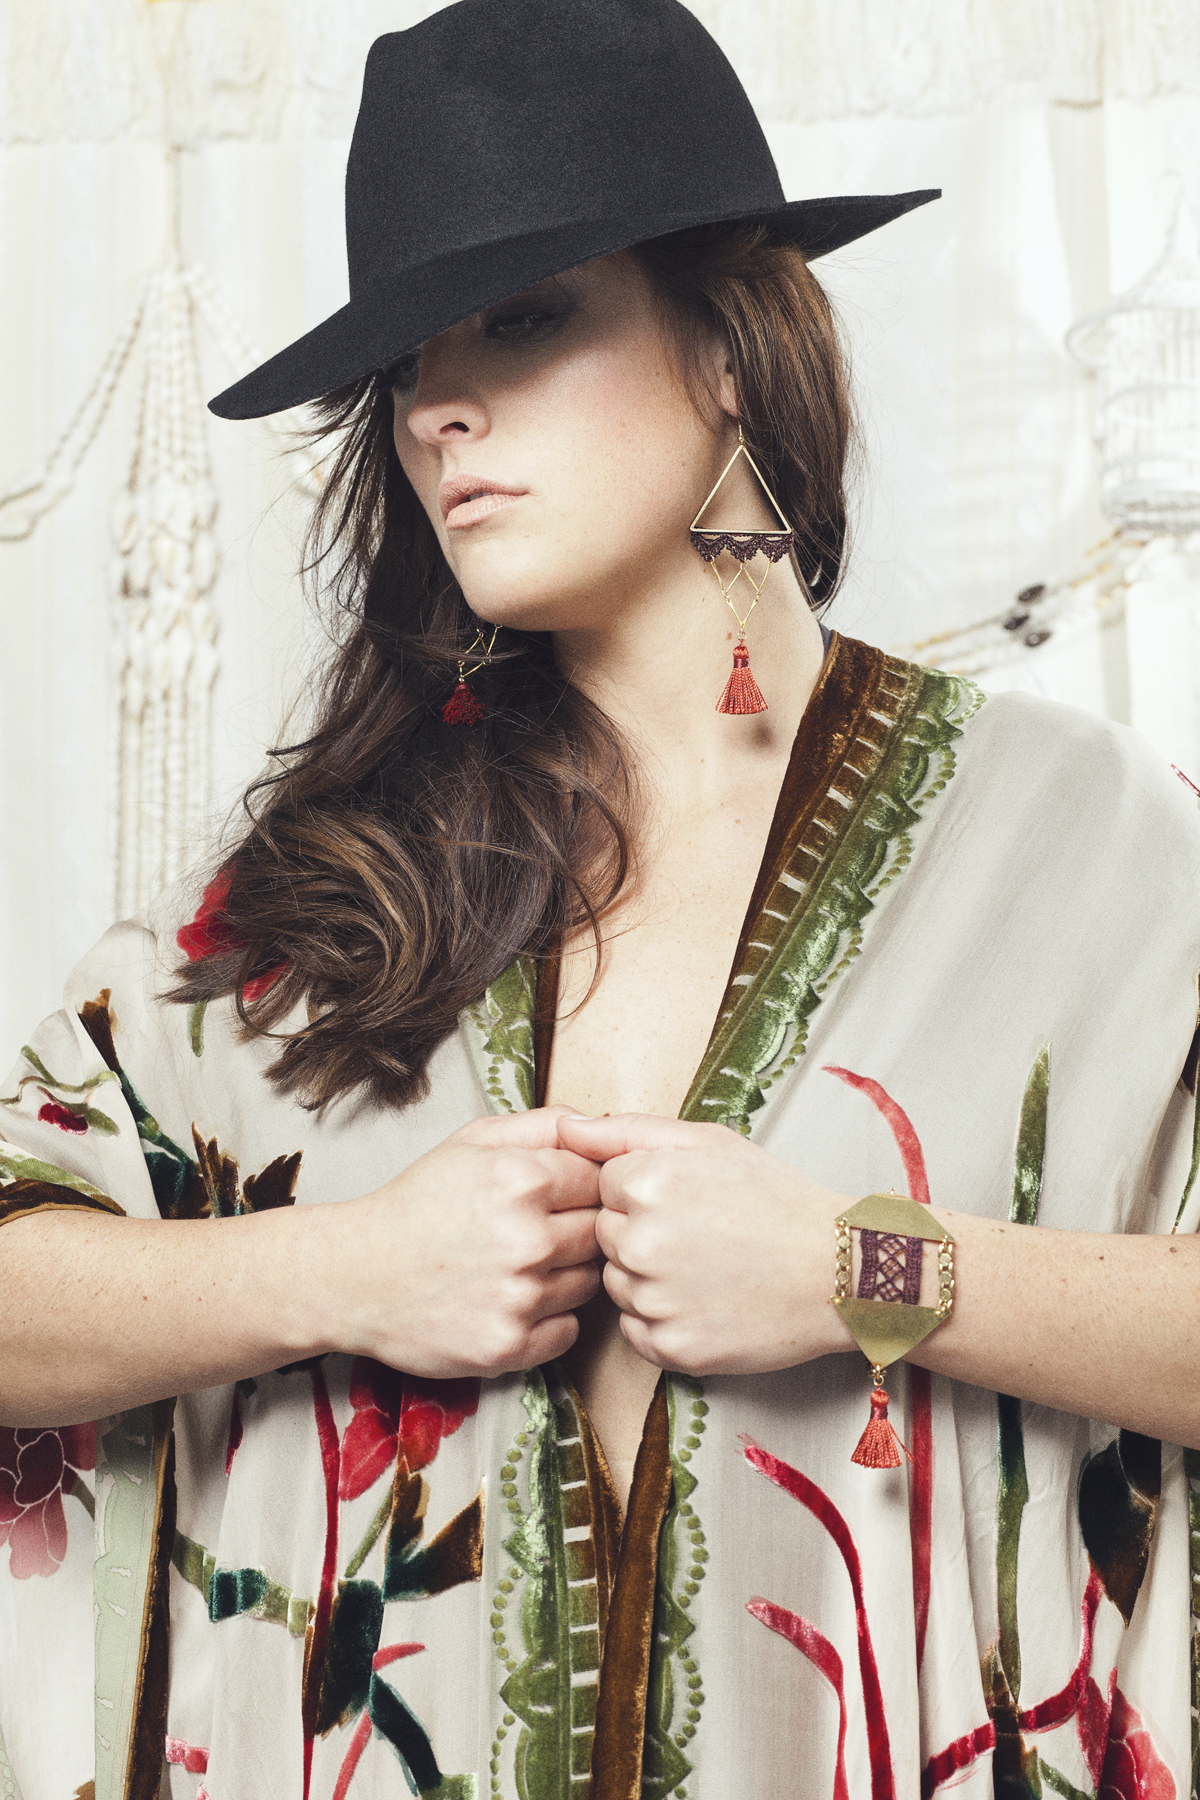 Marrakech earrings (details here) + Cairo bracelet (SOLD OUT)